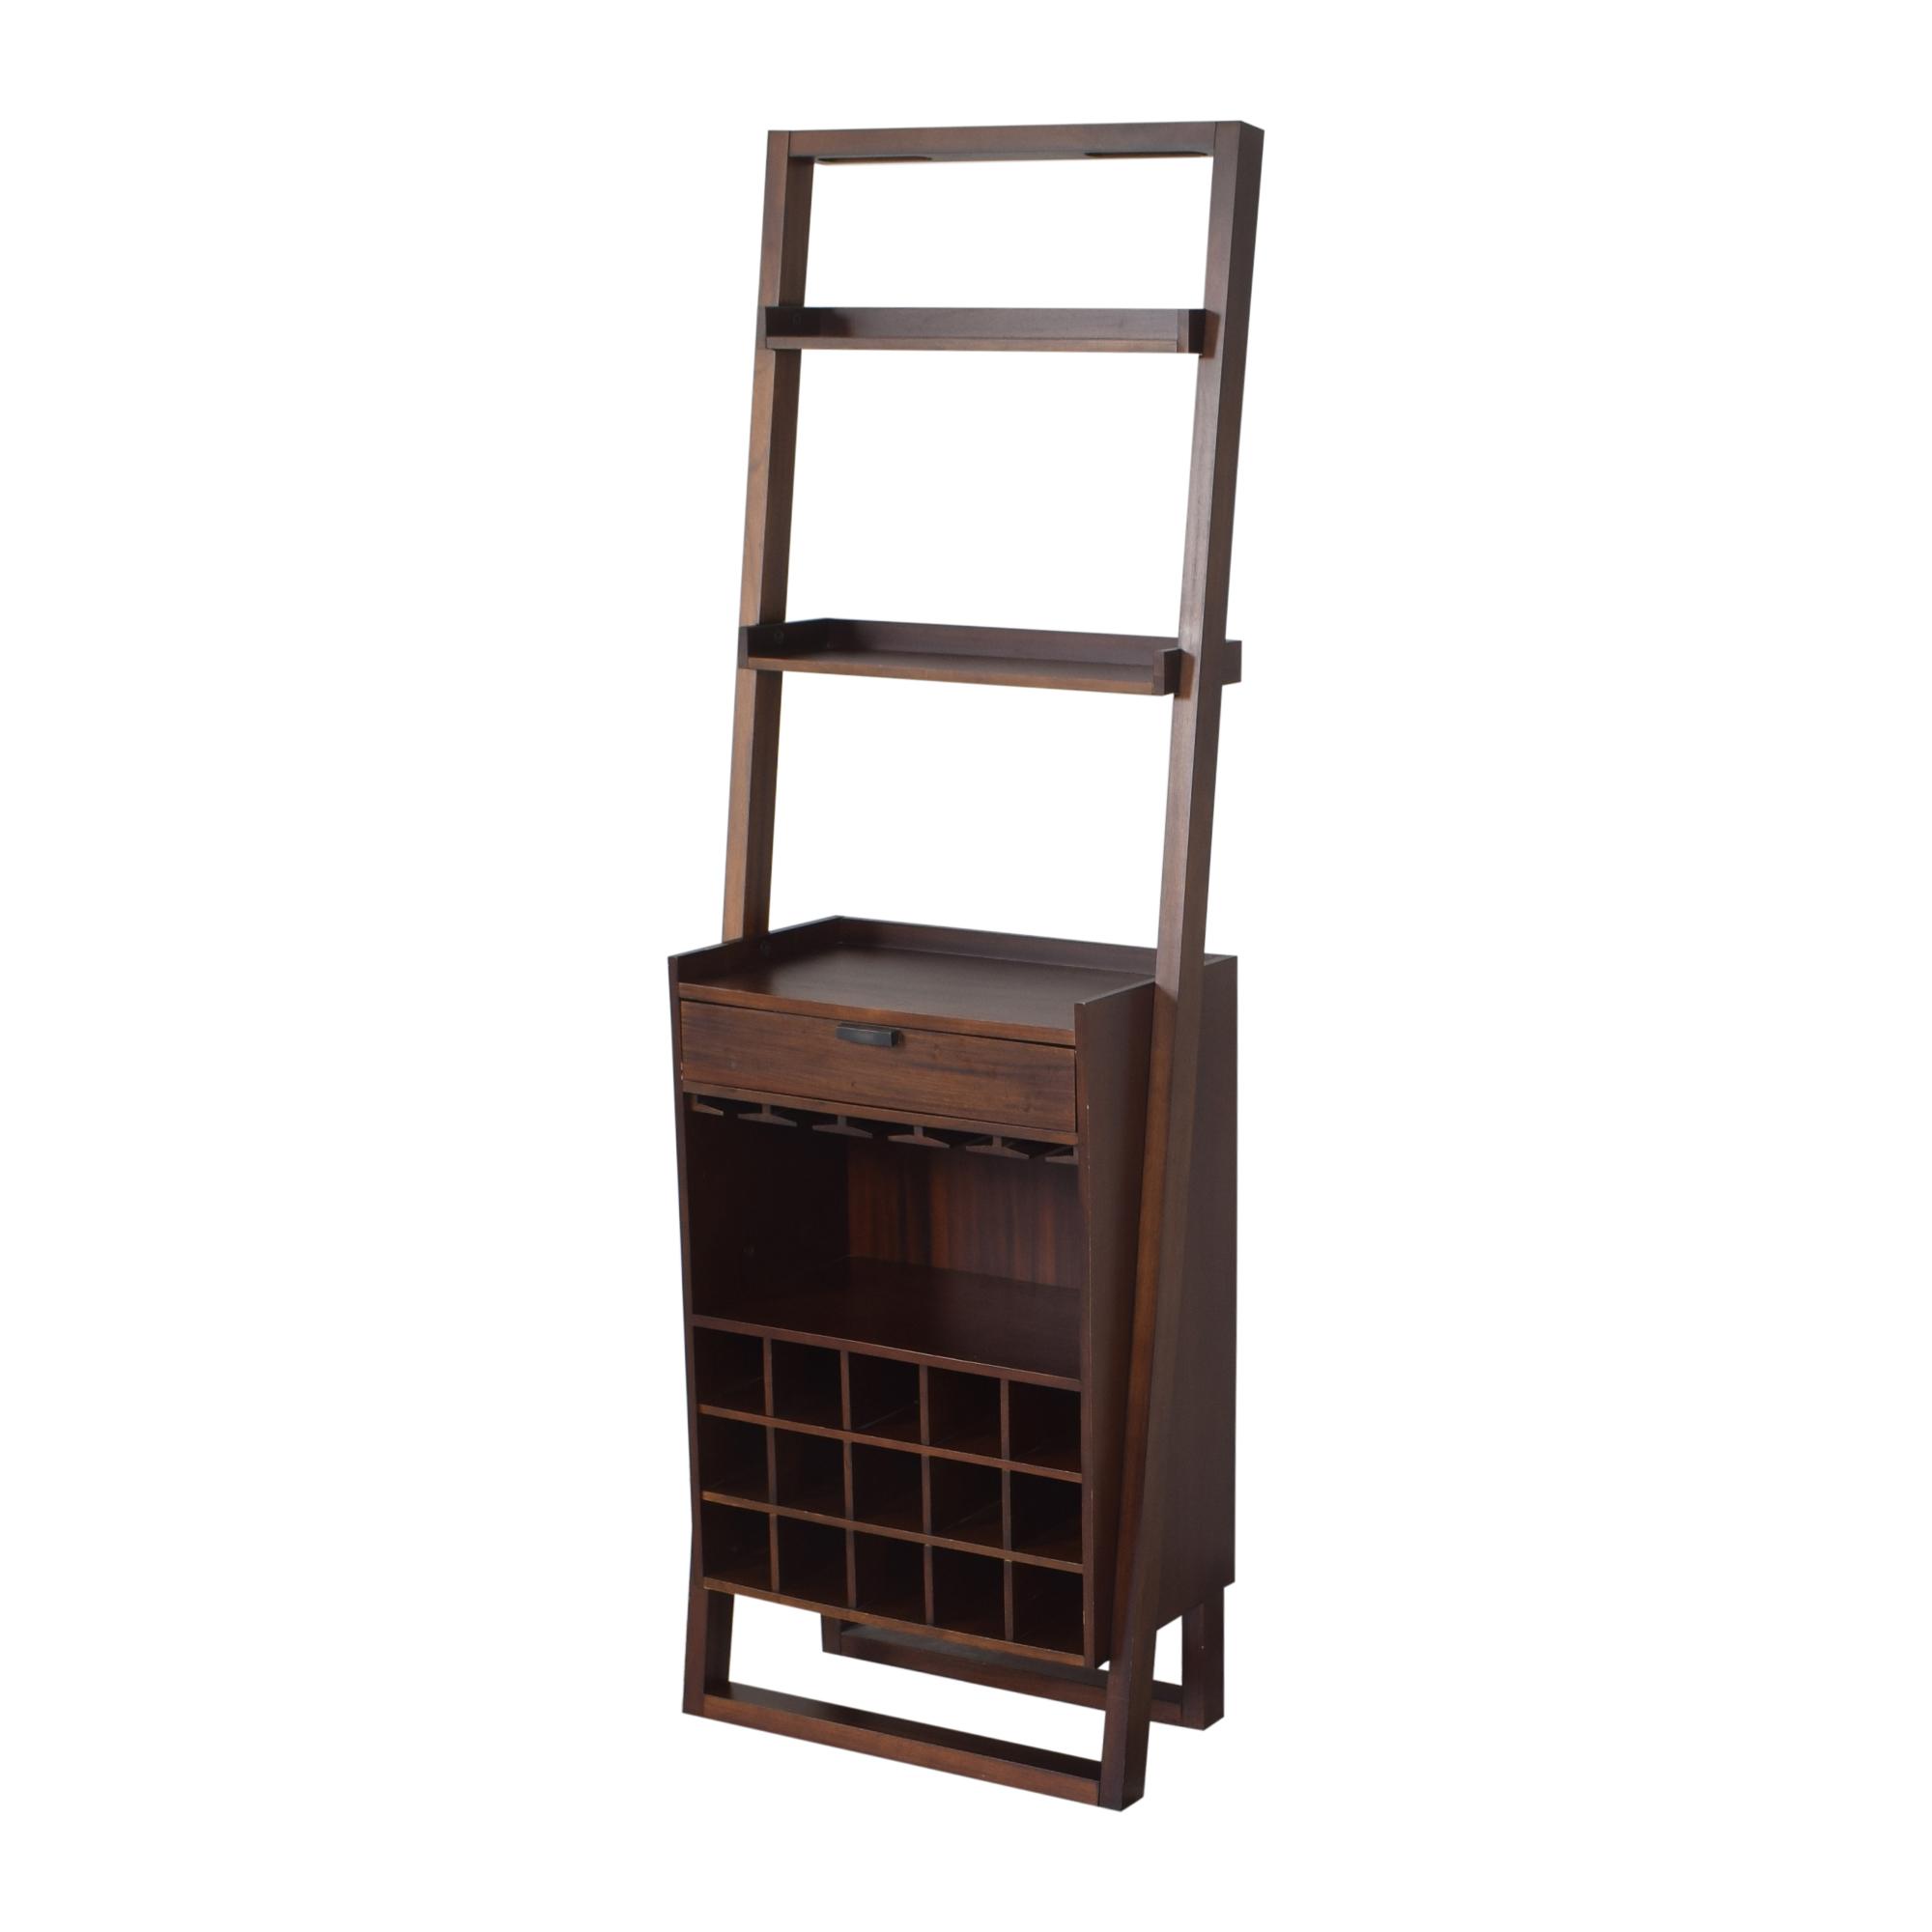 Crate & Barrel Crate & Barrel Sloane Leaning Wine Bar for sale